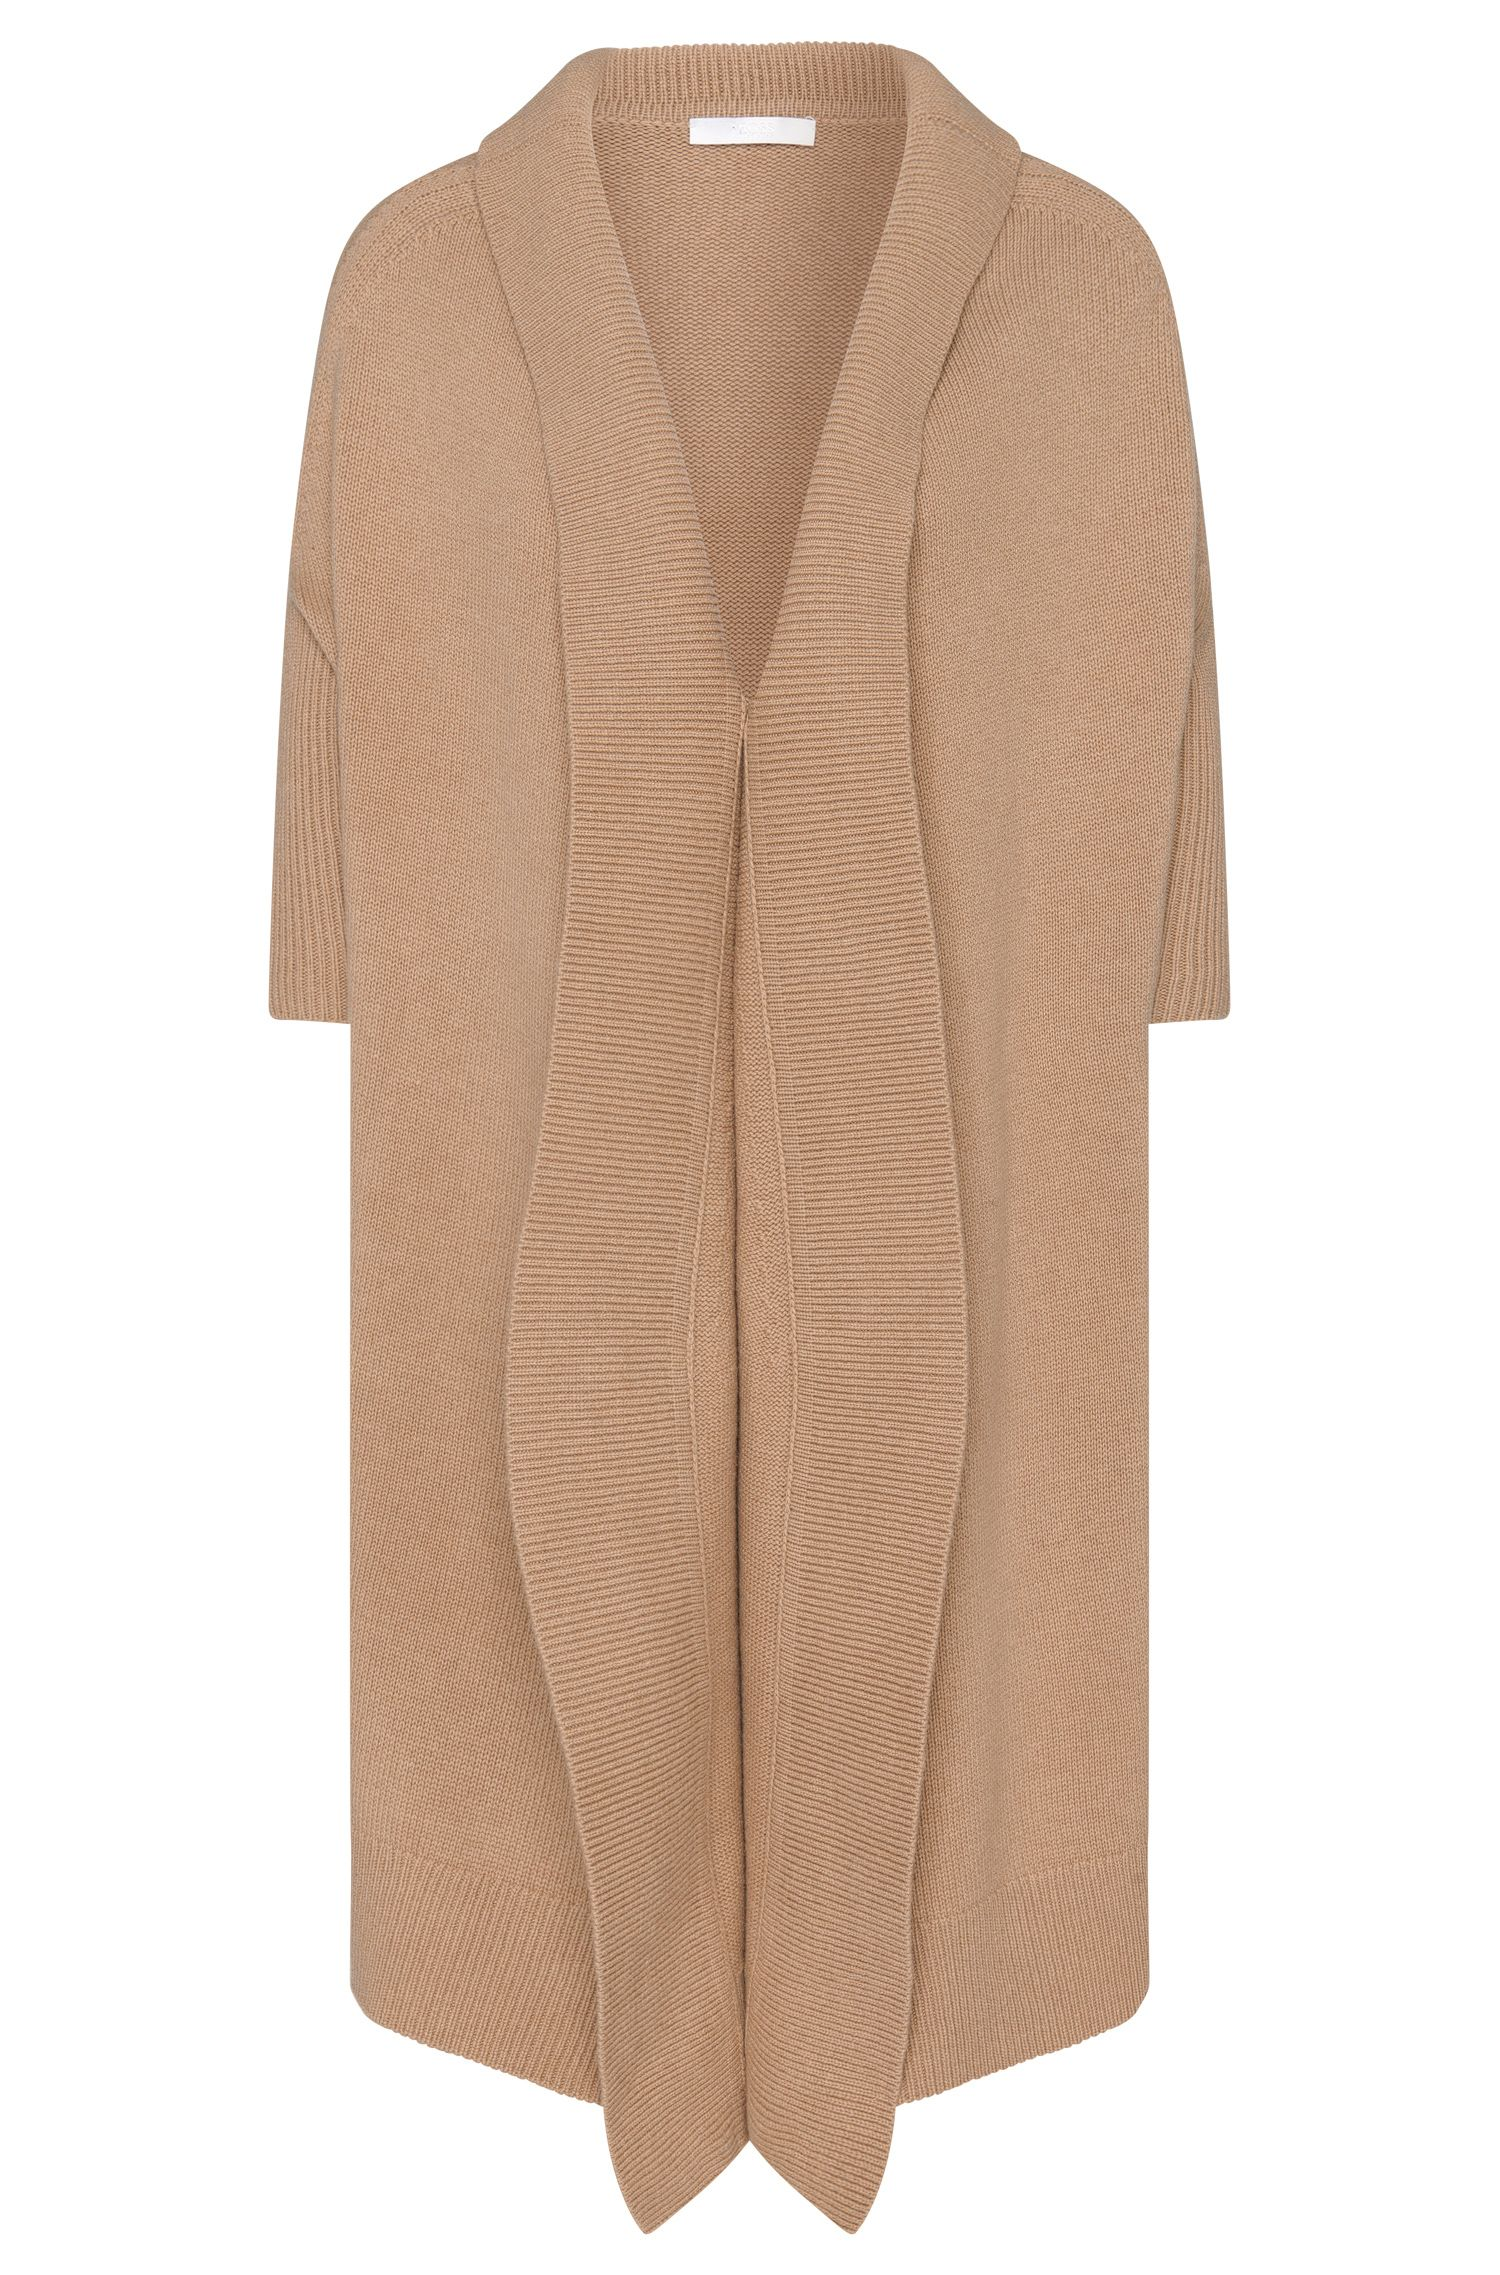 'Farela' | Virgin Wool Cashmere Yak Longline Cardigan